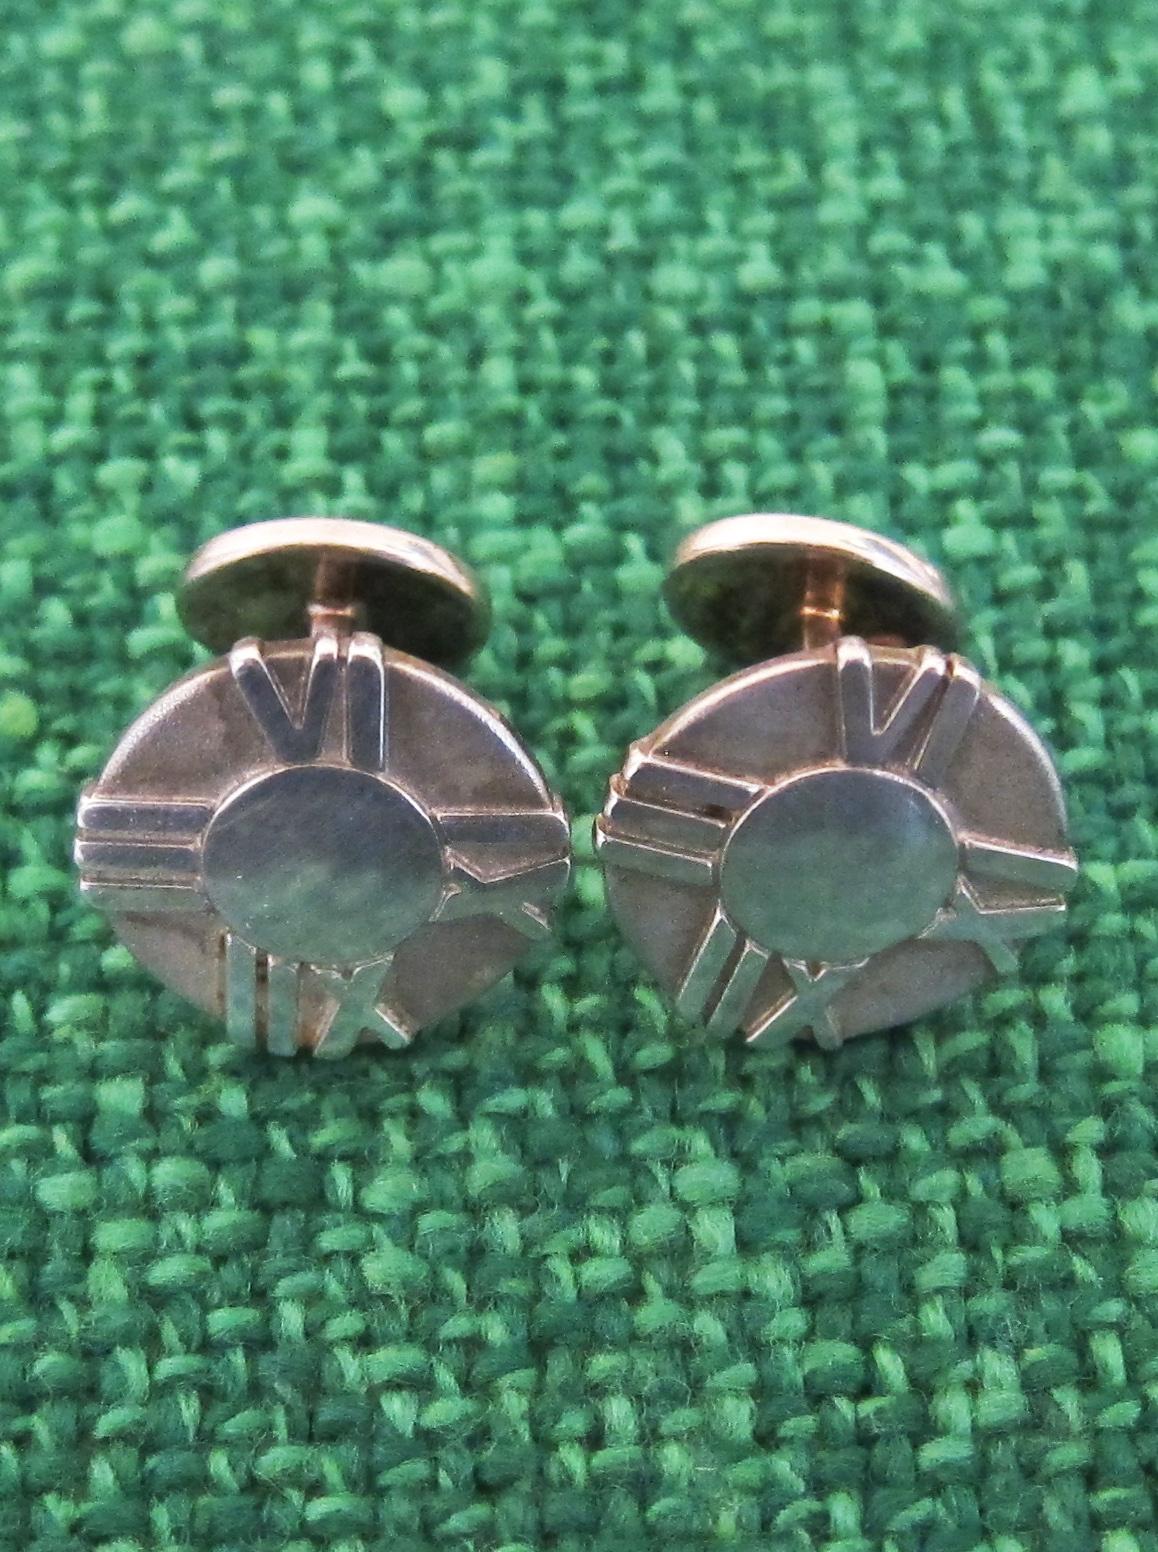 Pair of TIFFANY cufflinks